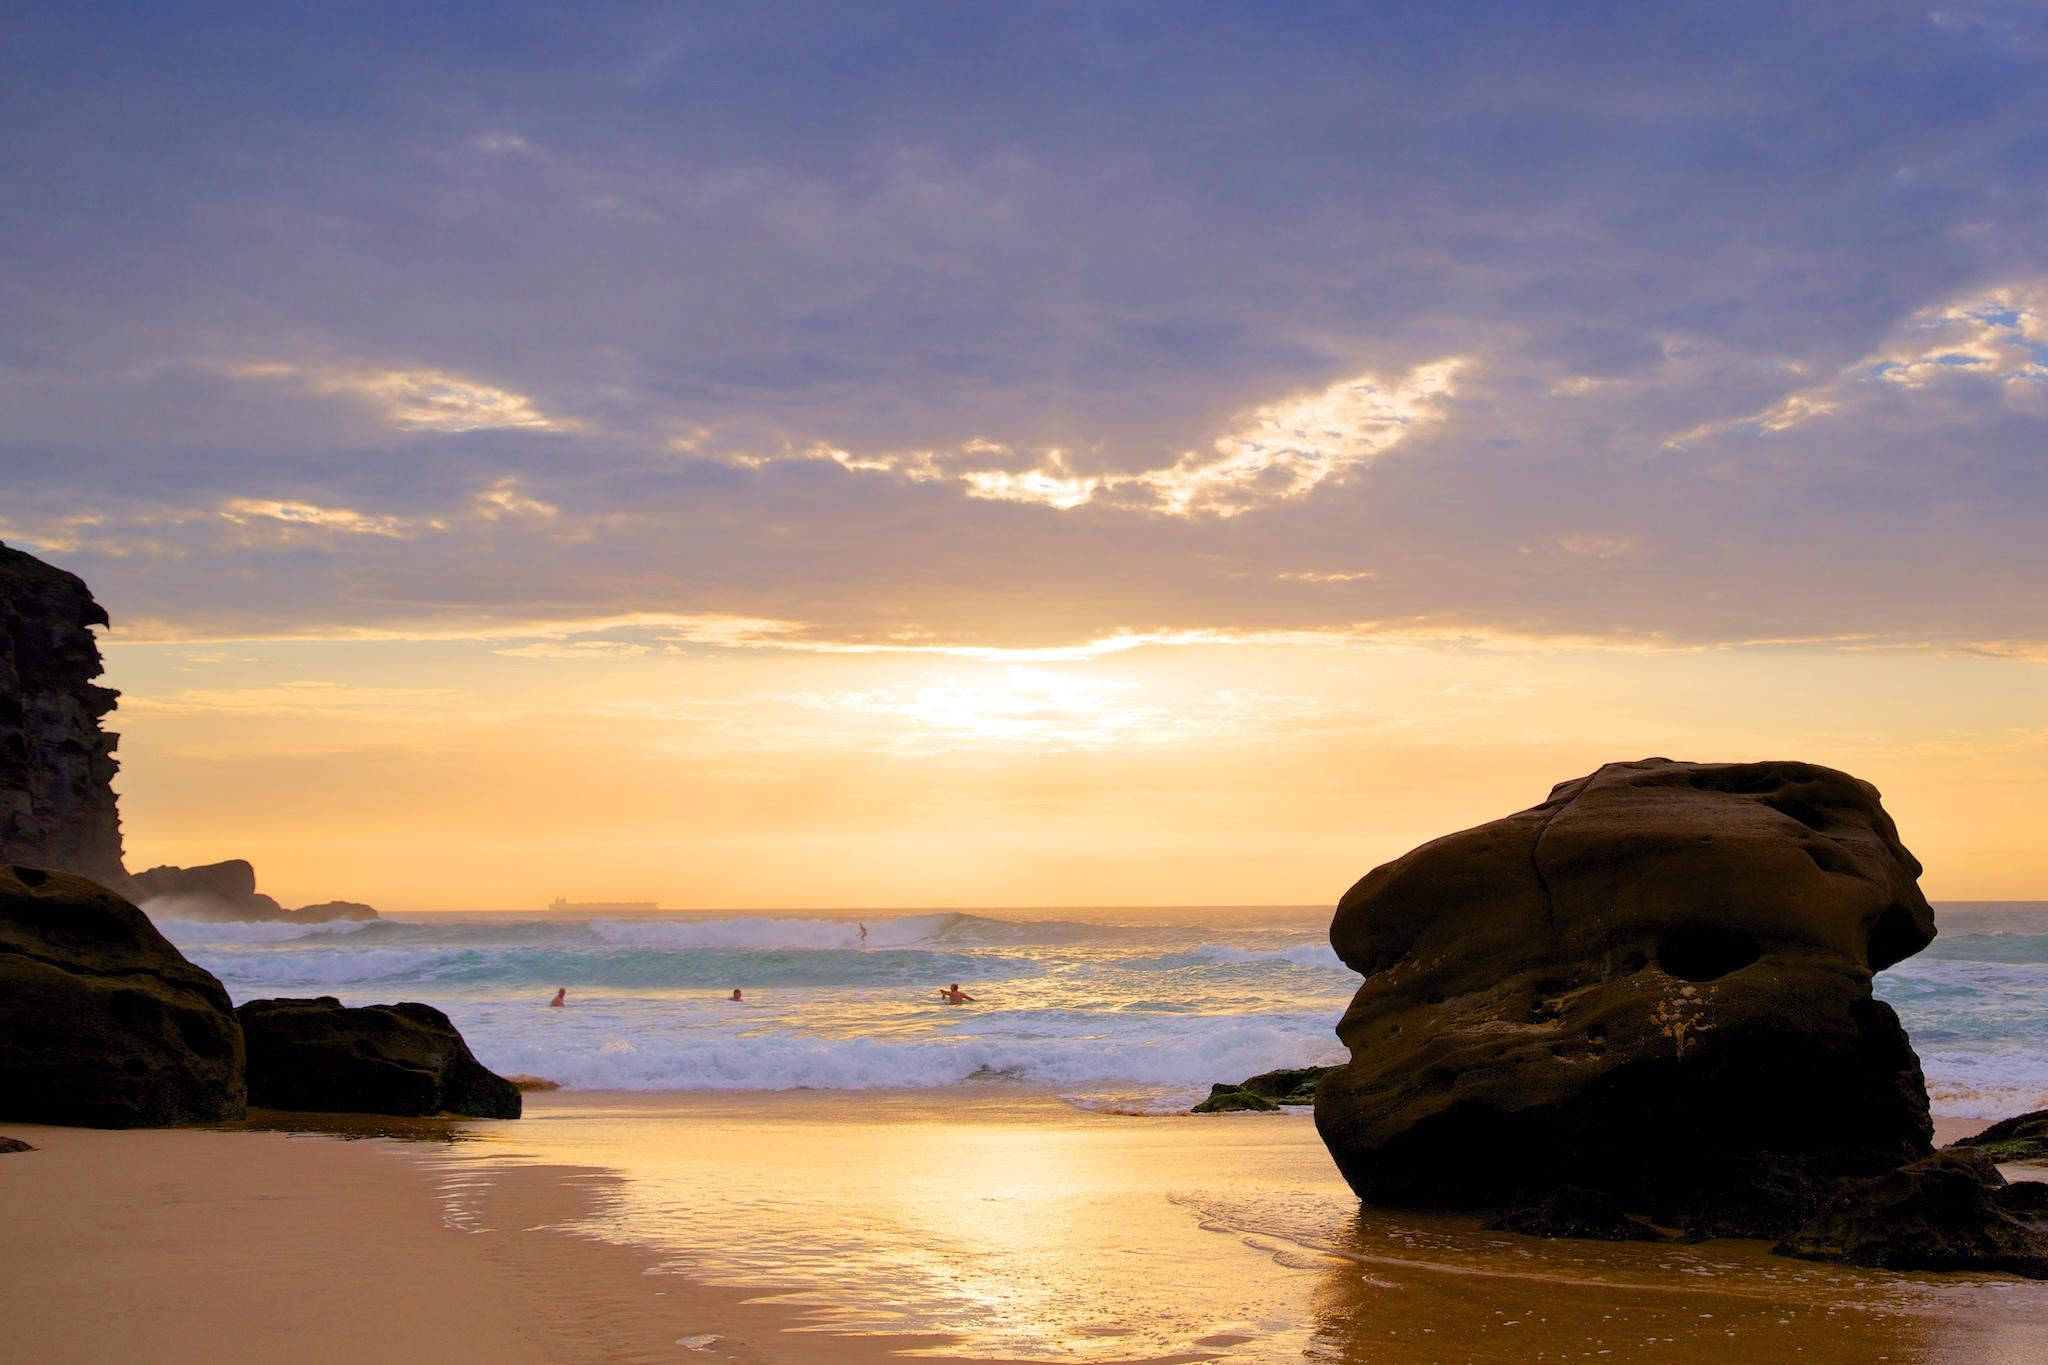 redhead-beach-dawn-redhead-newcastle-nsw-australia-landscape-print